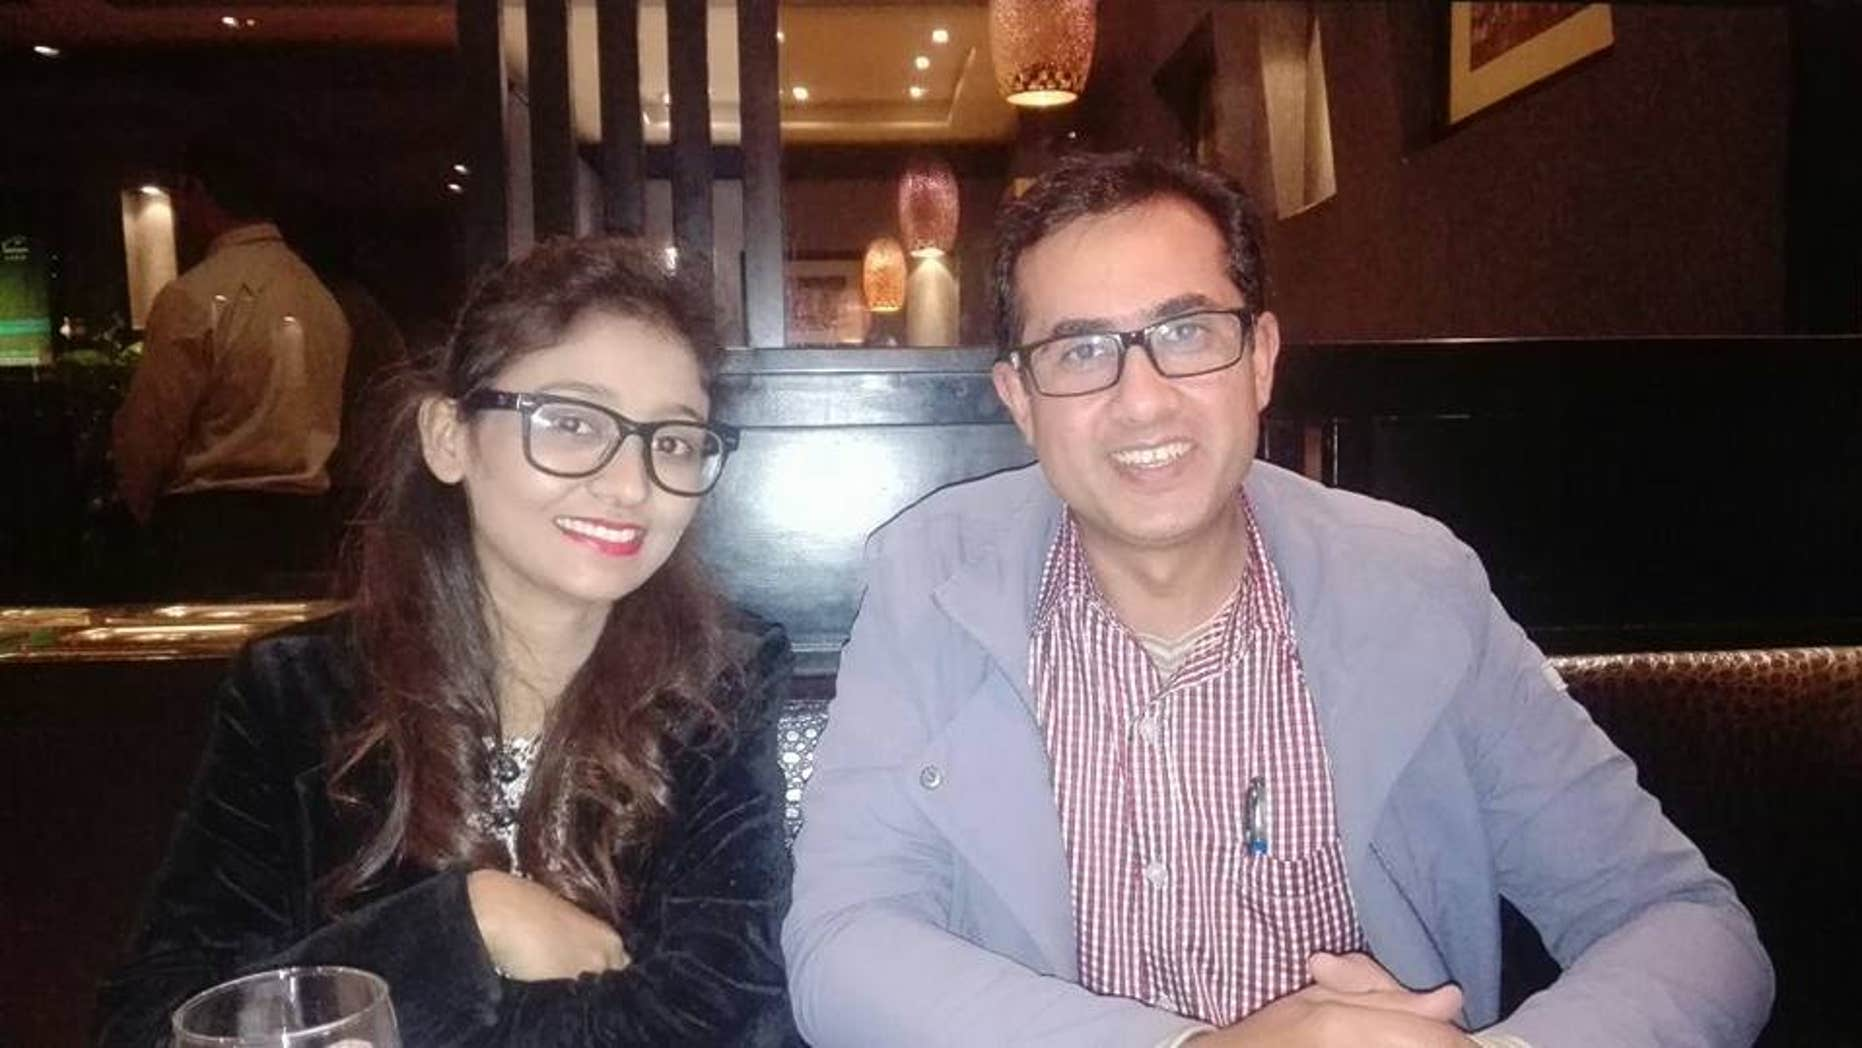 Fischel Benkhald (right) in Pakistan with BPCA officer Ambar Saroya.